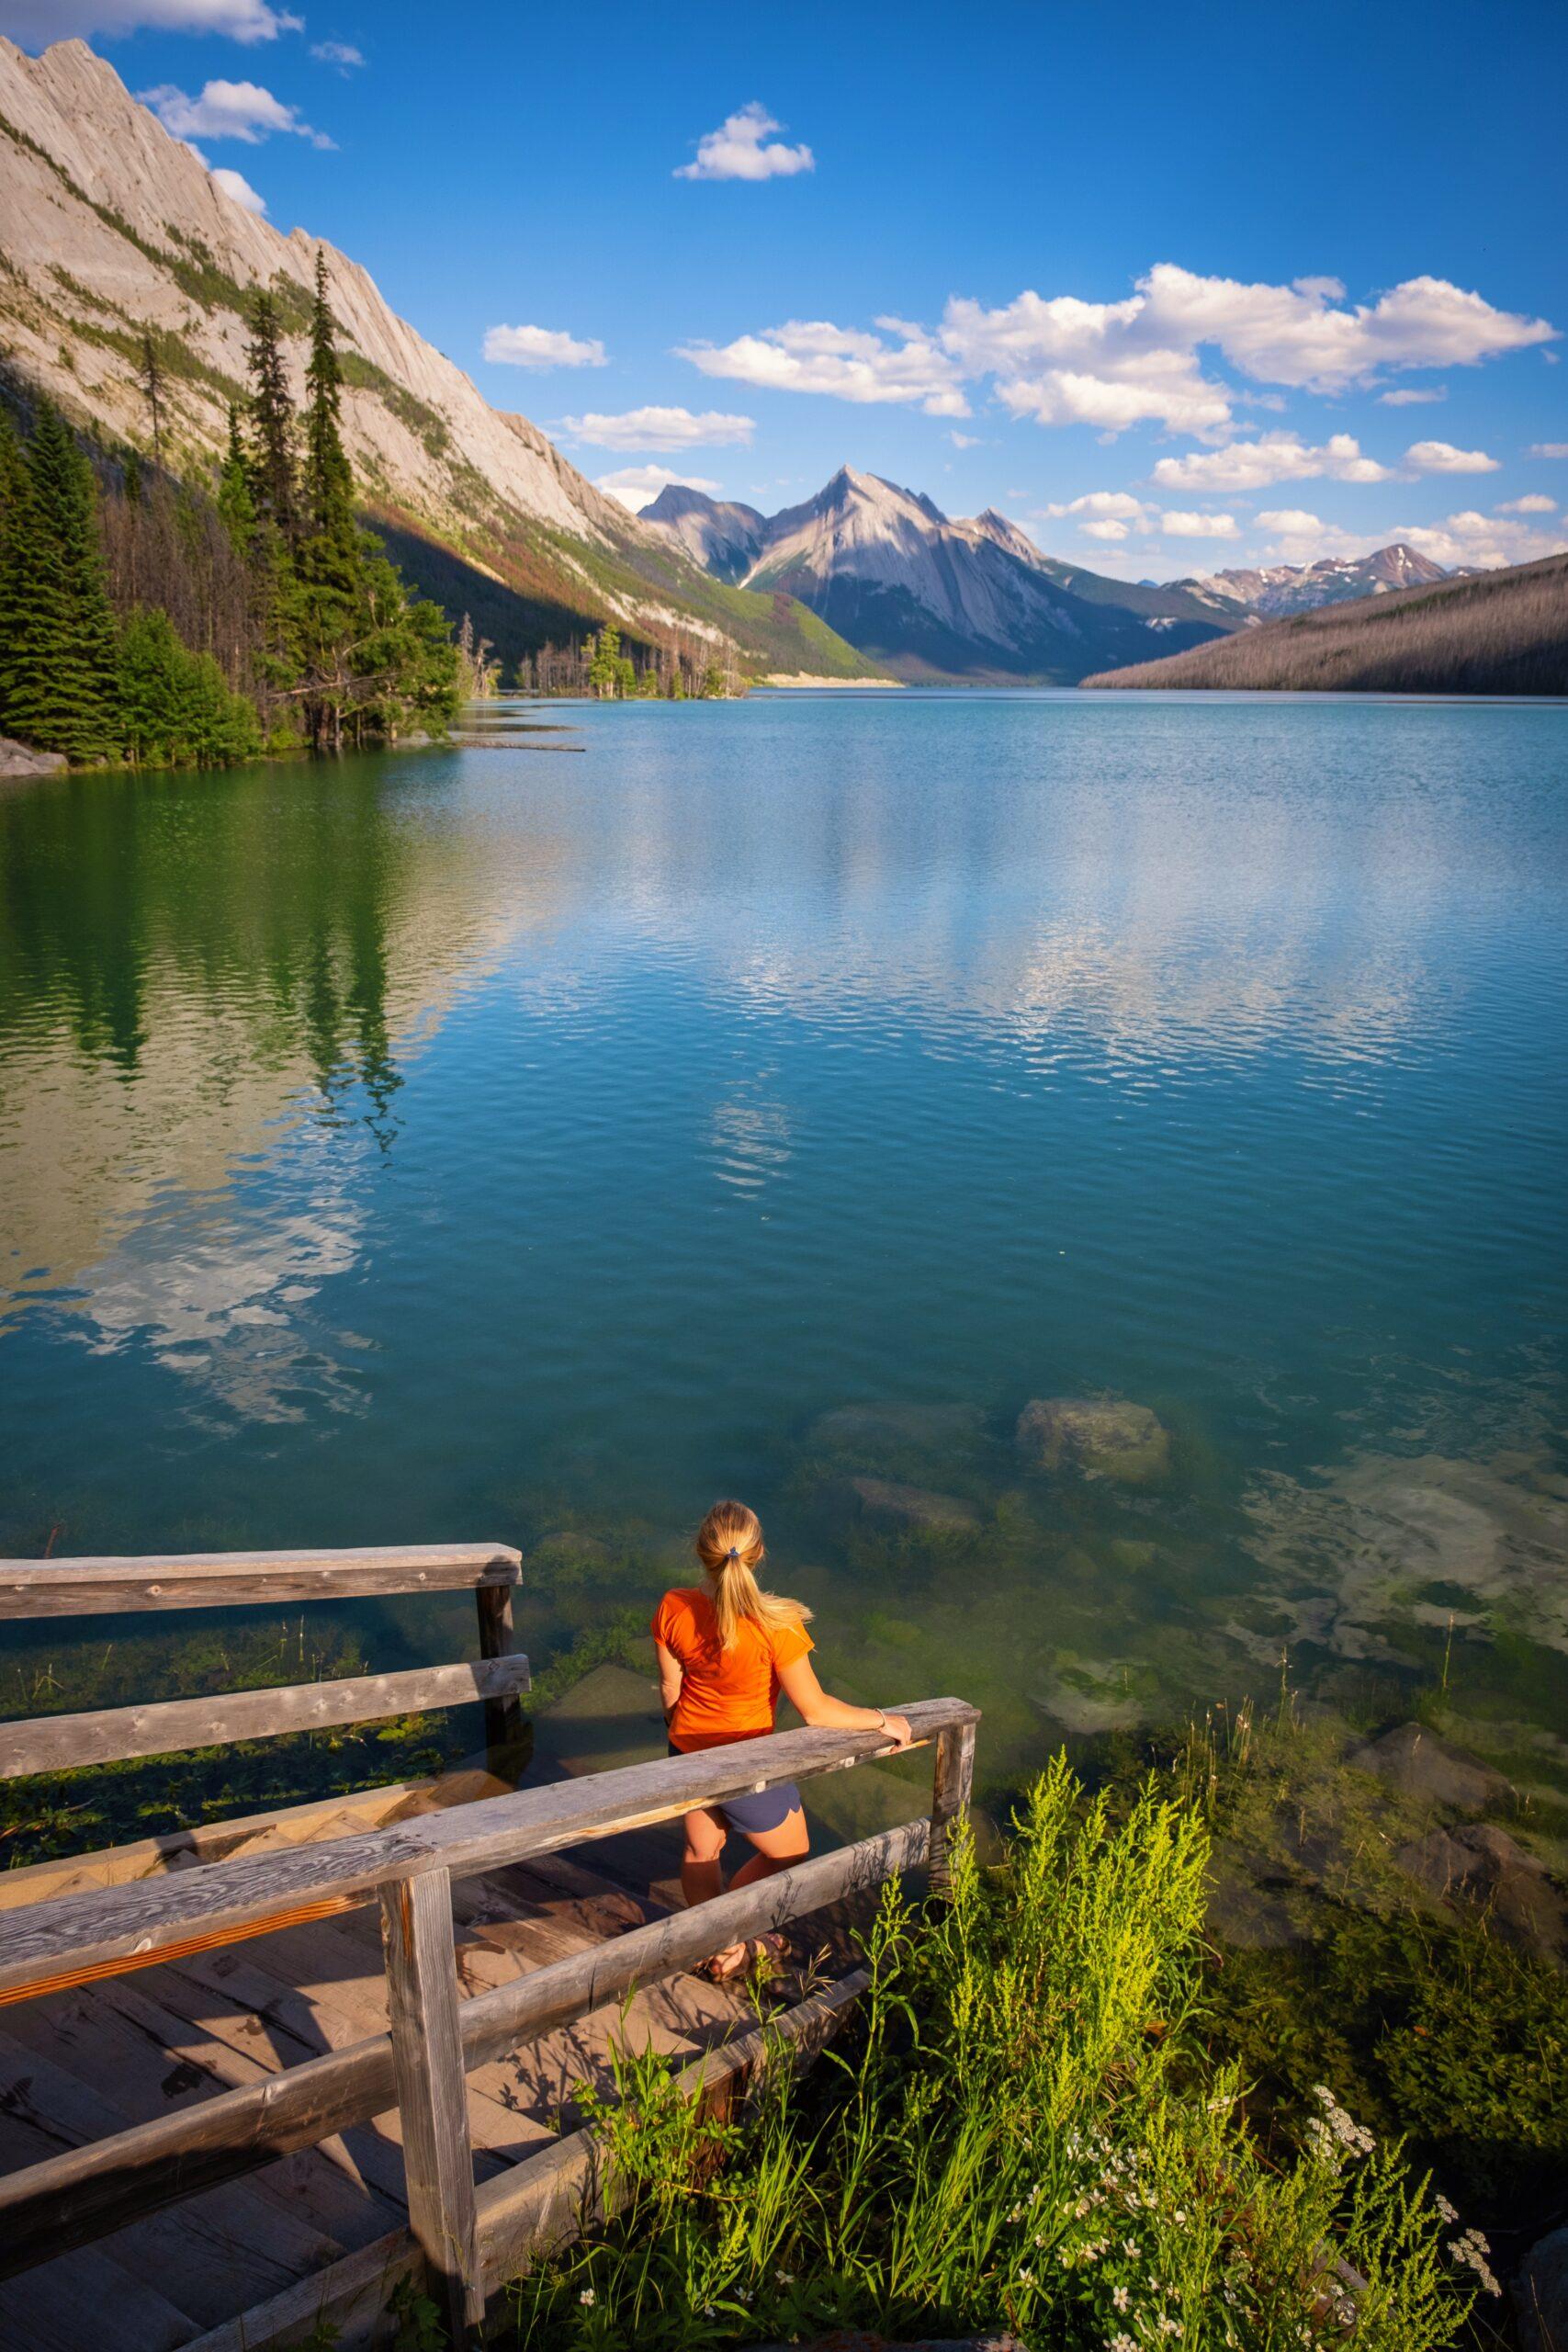 Things to do in Jasper